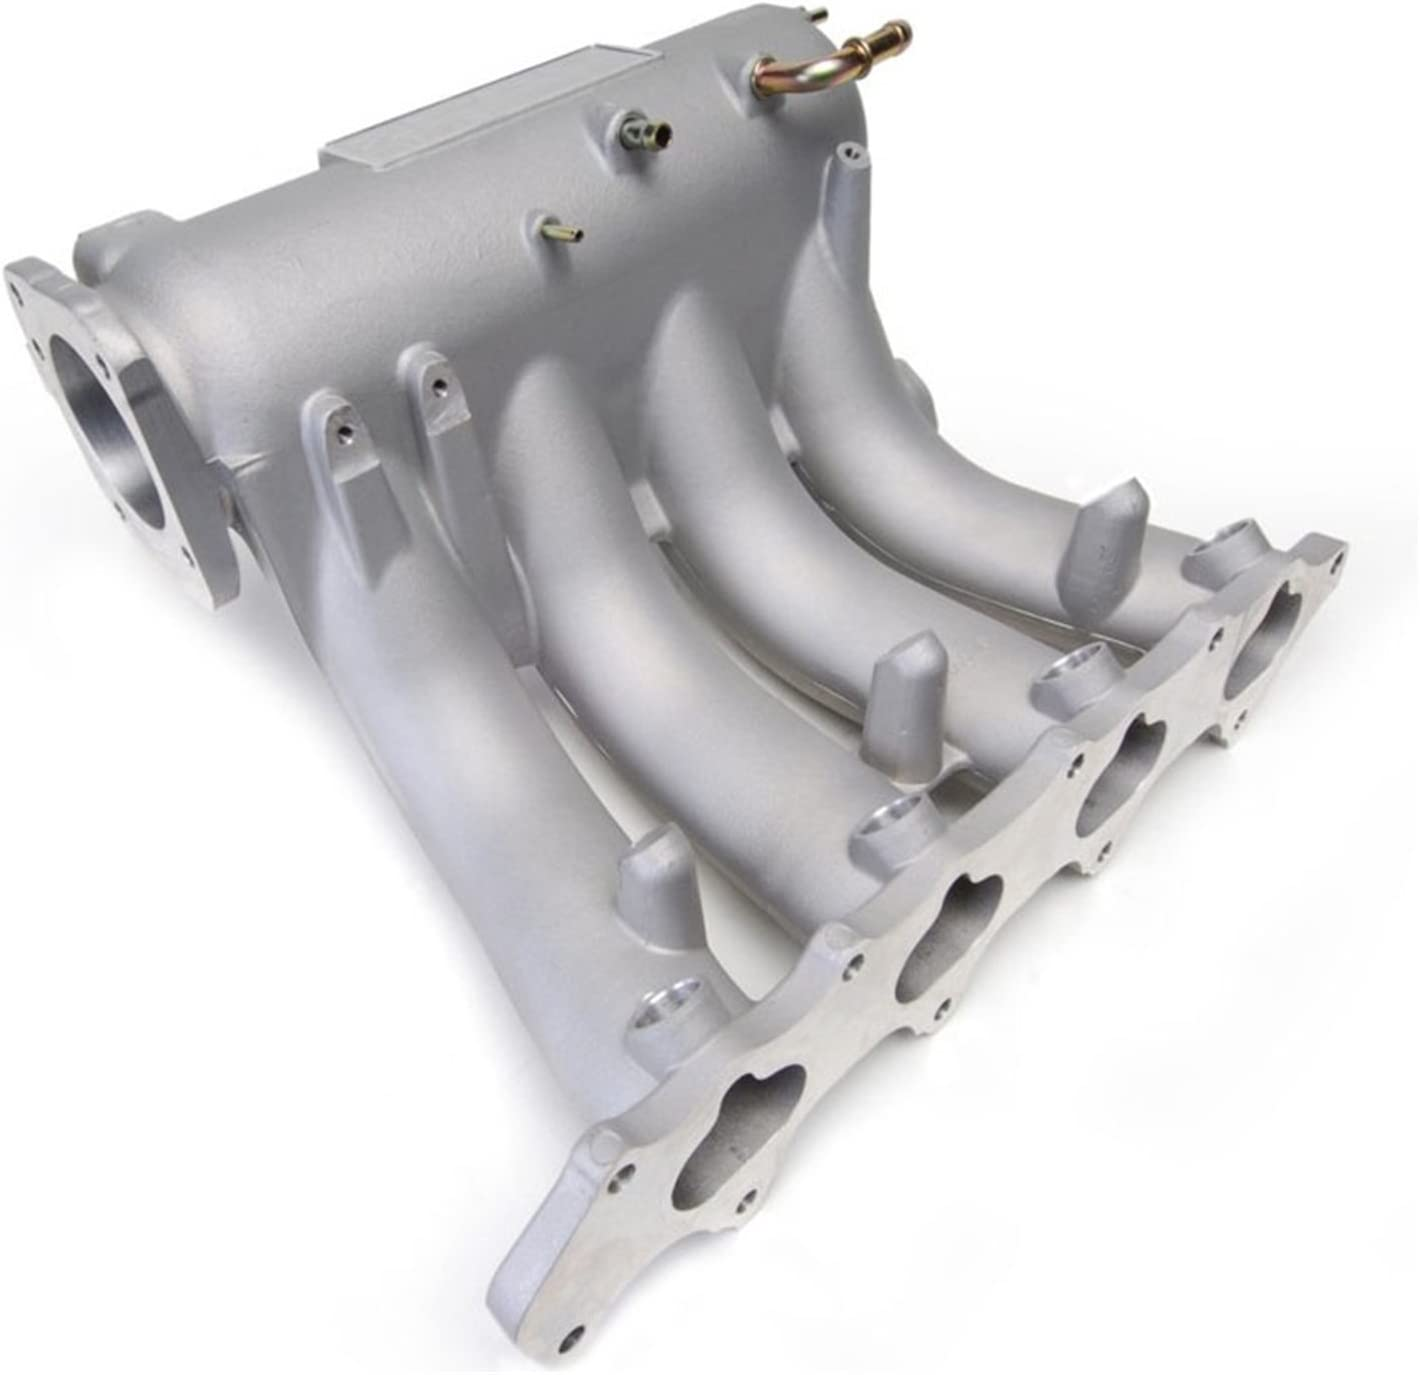 Skunk2 307-05-0300 Pro Series Silver 蔵 Intake for Honda H Manifold 販売実績No.1